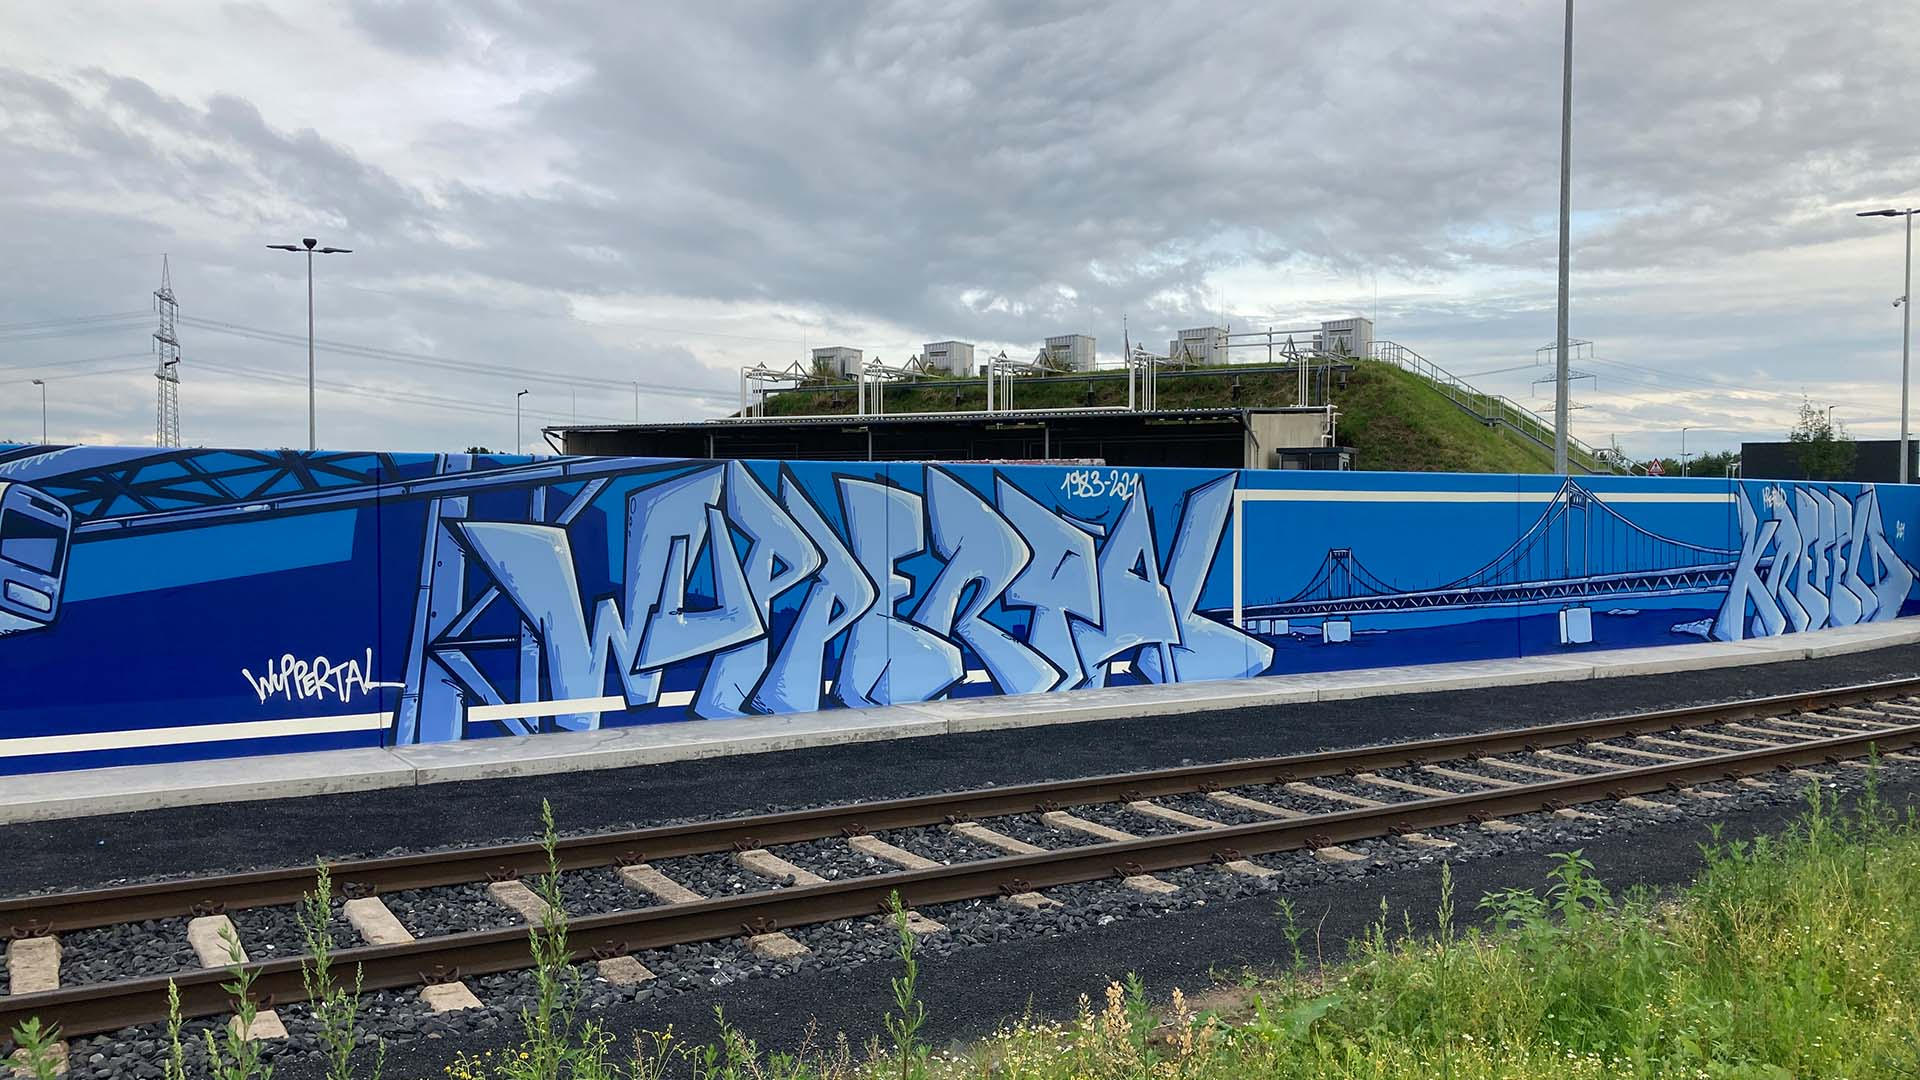 Wuppertal, Graffiti, Caratgas, Unternehmen, Firma, Krefeld, Gaswerk